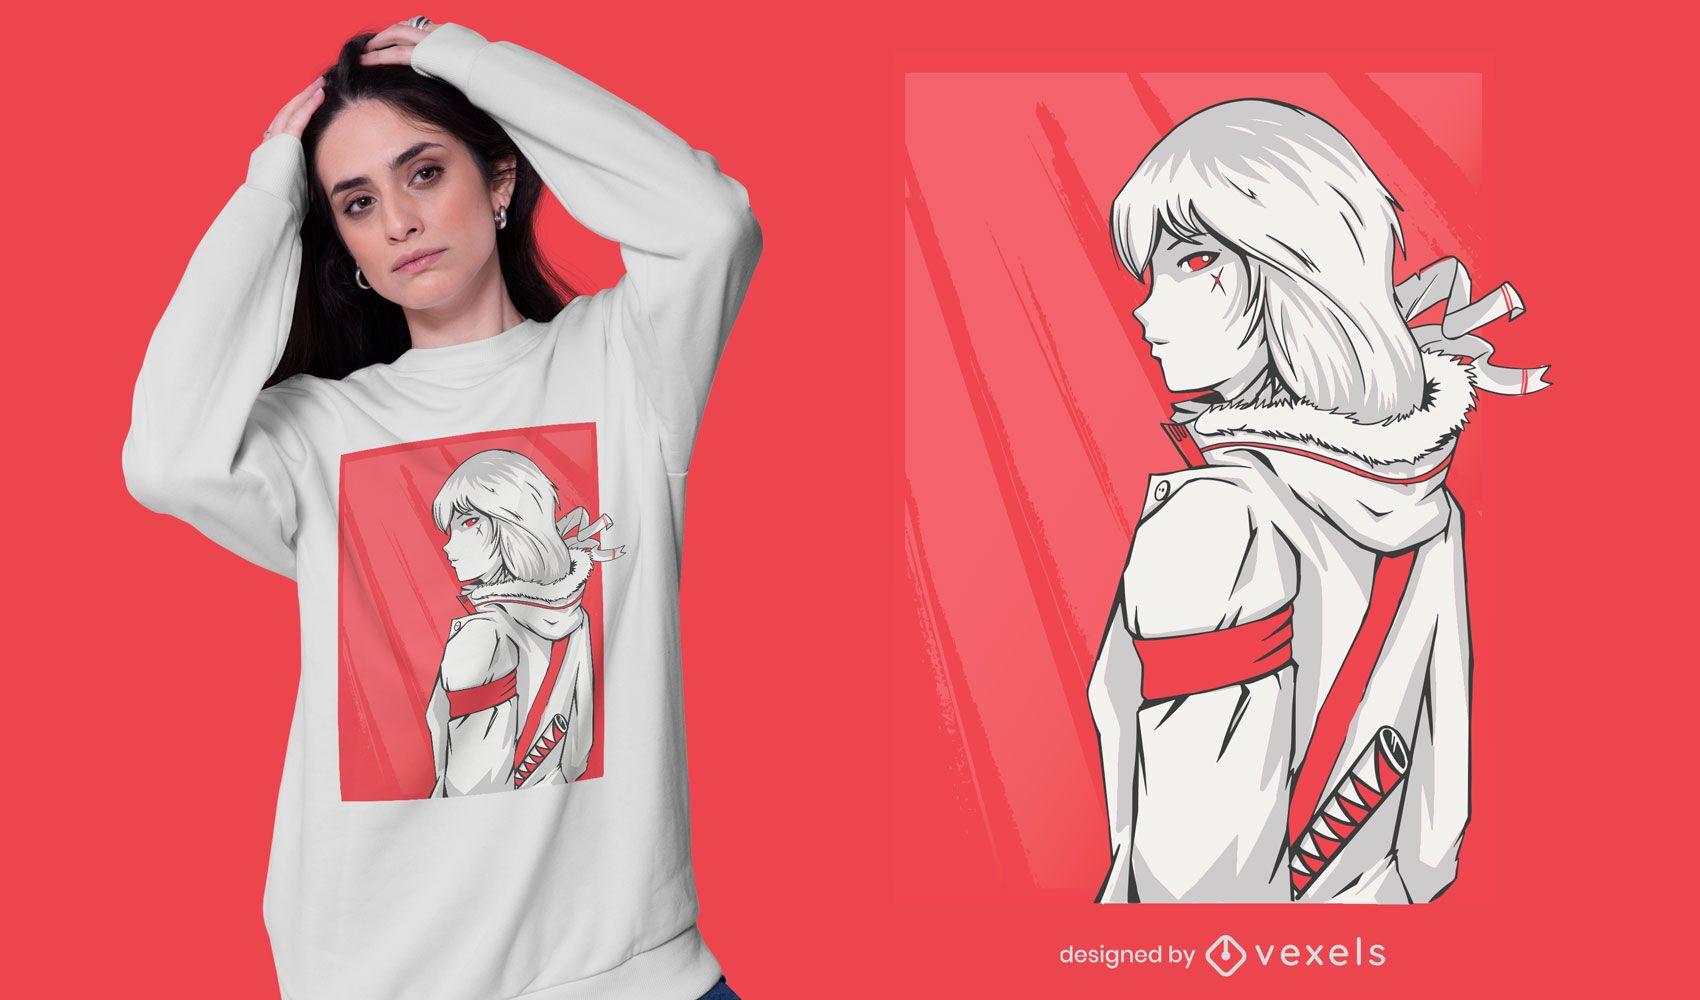 Action anime girl character t-shirt design